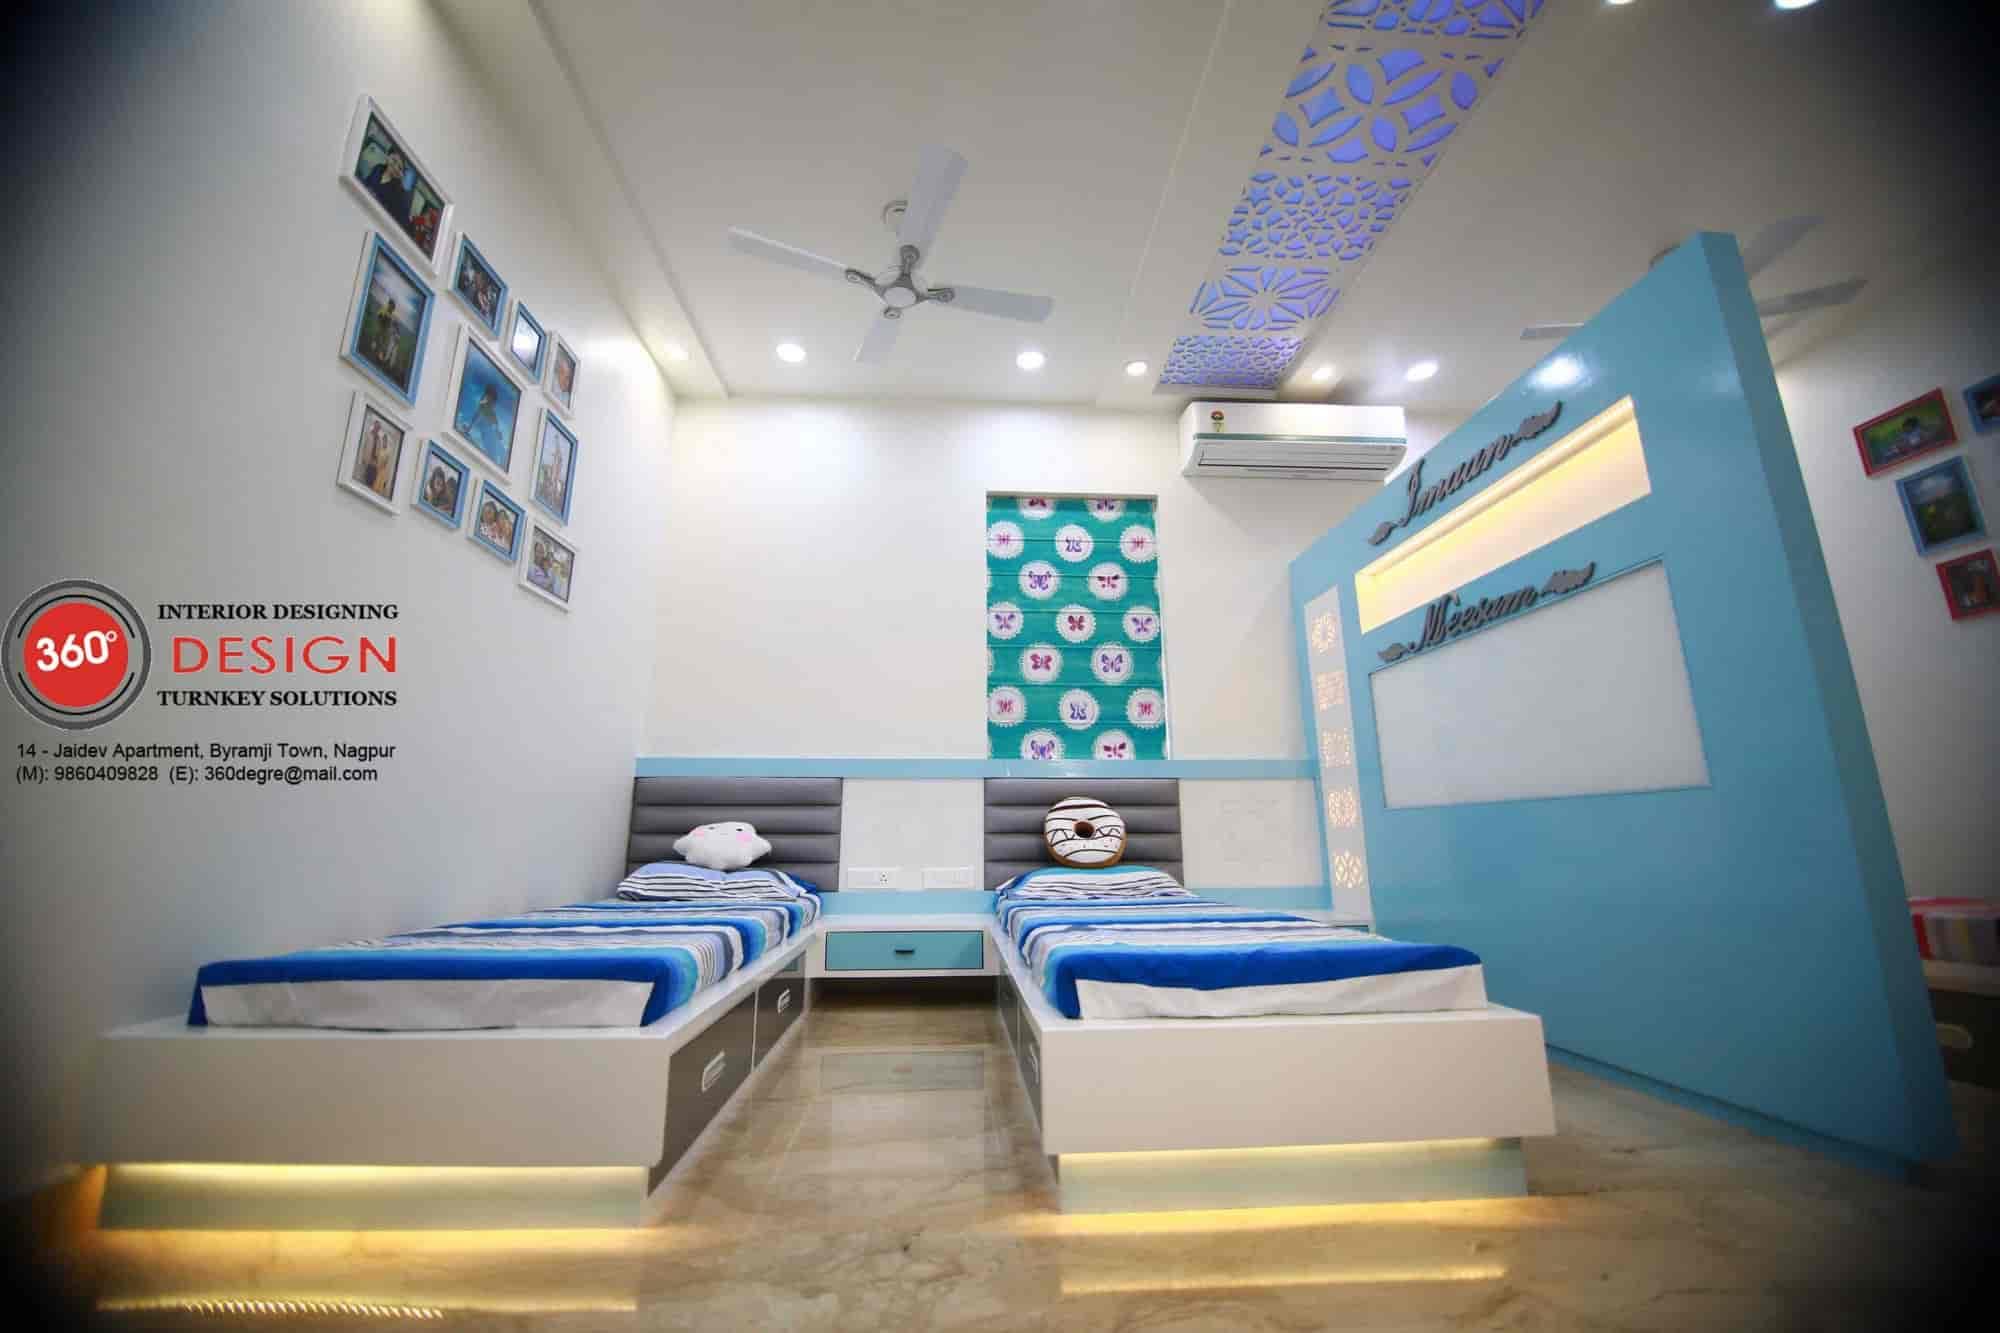 design master condo associate degree room interior